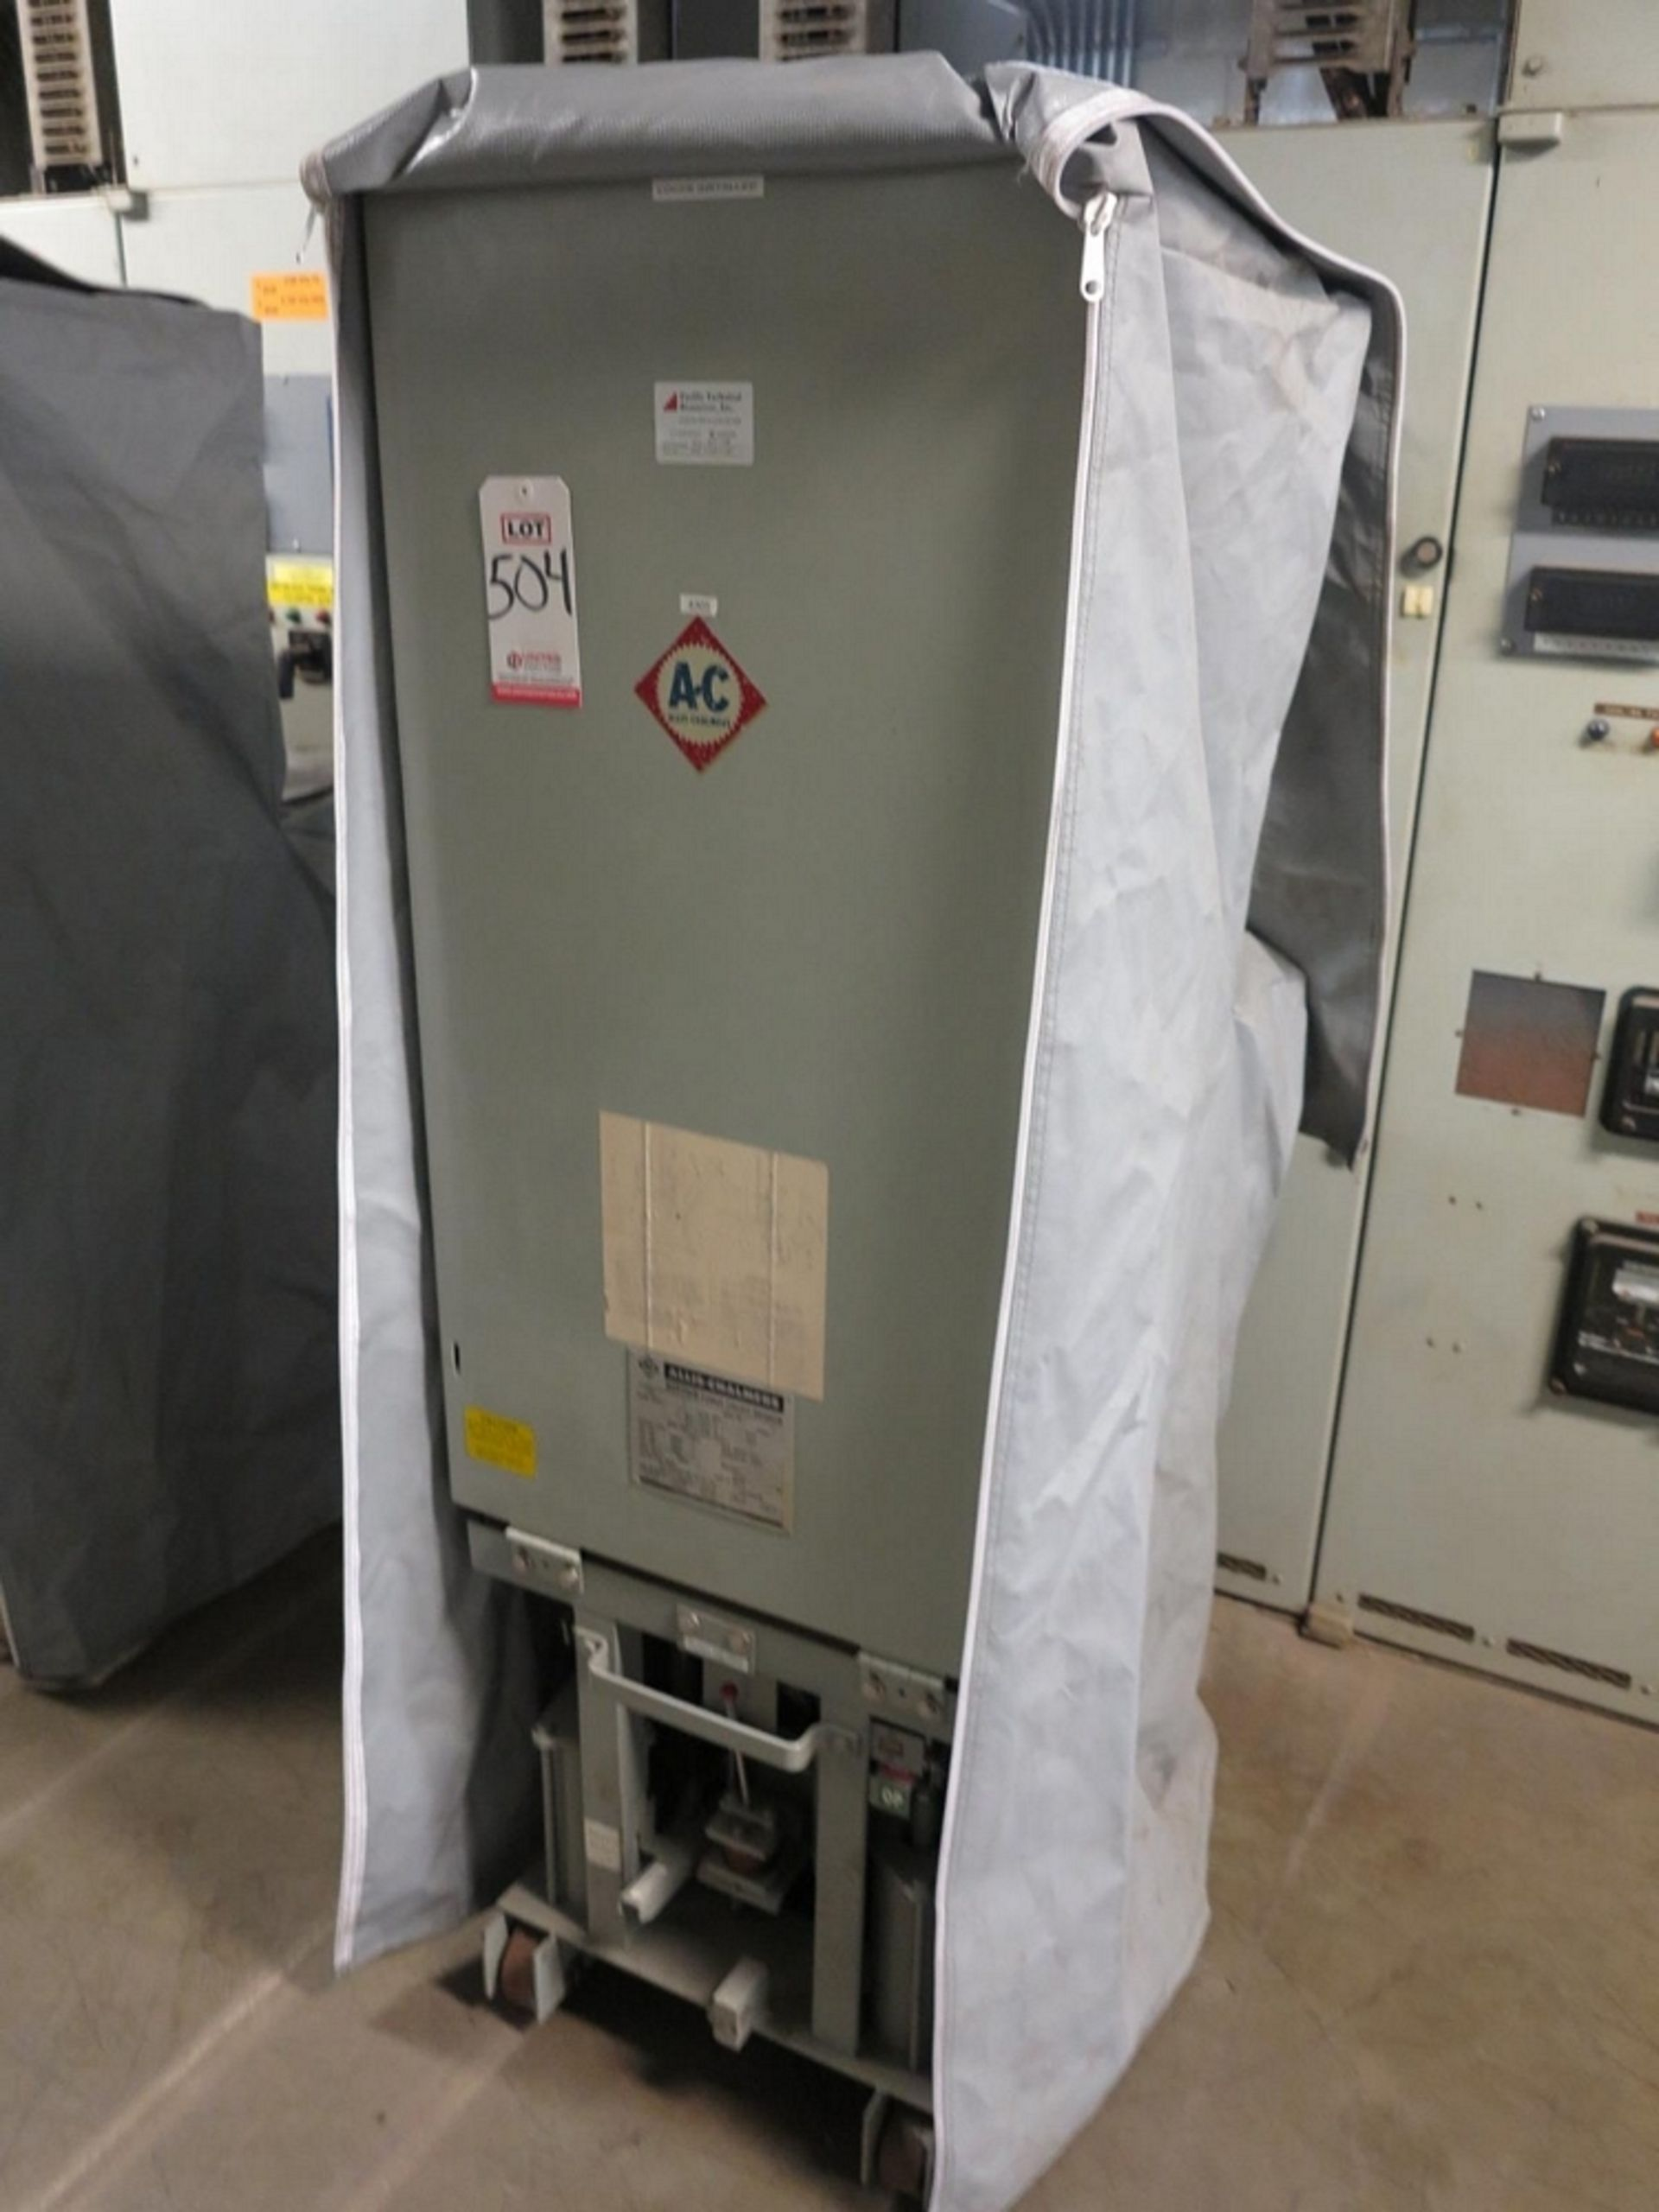 Lot 504 - ALLIS CHALMERS CIRCUIT BREAKER, TYPE MA-250A-1, 4160 V, 1200 A